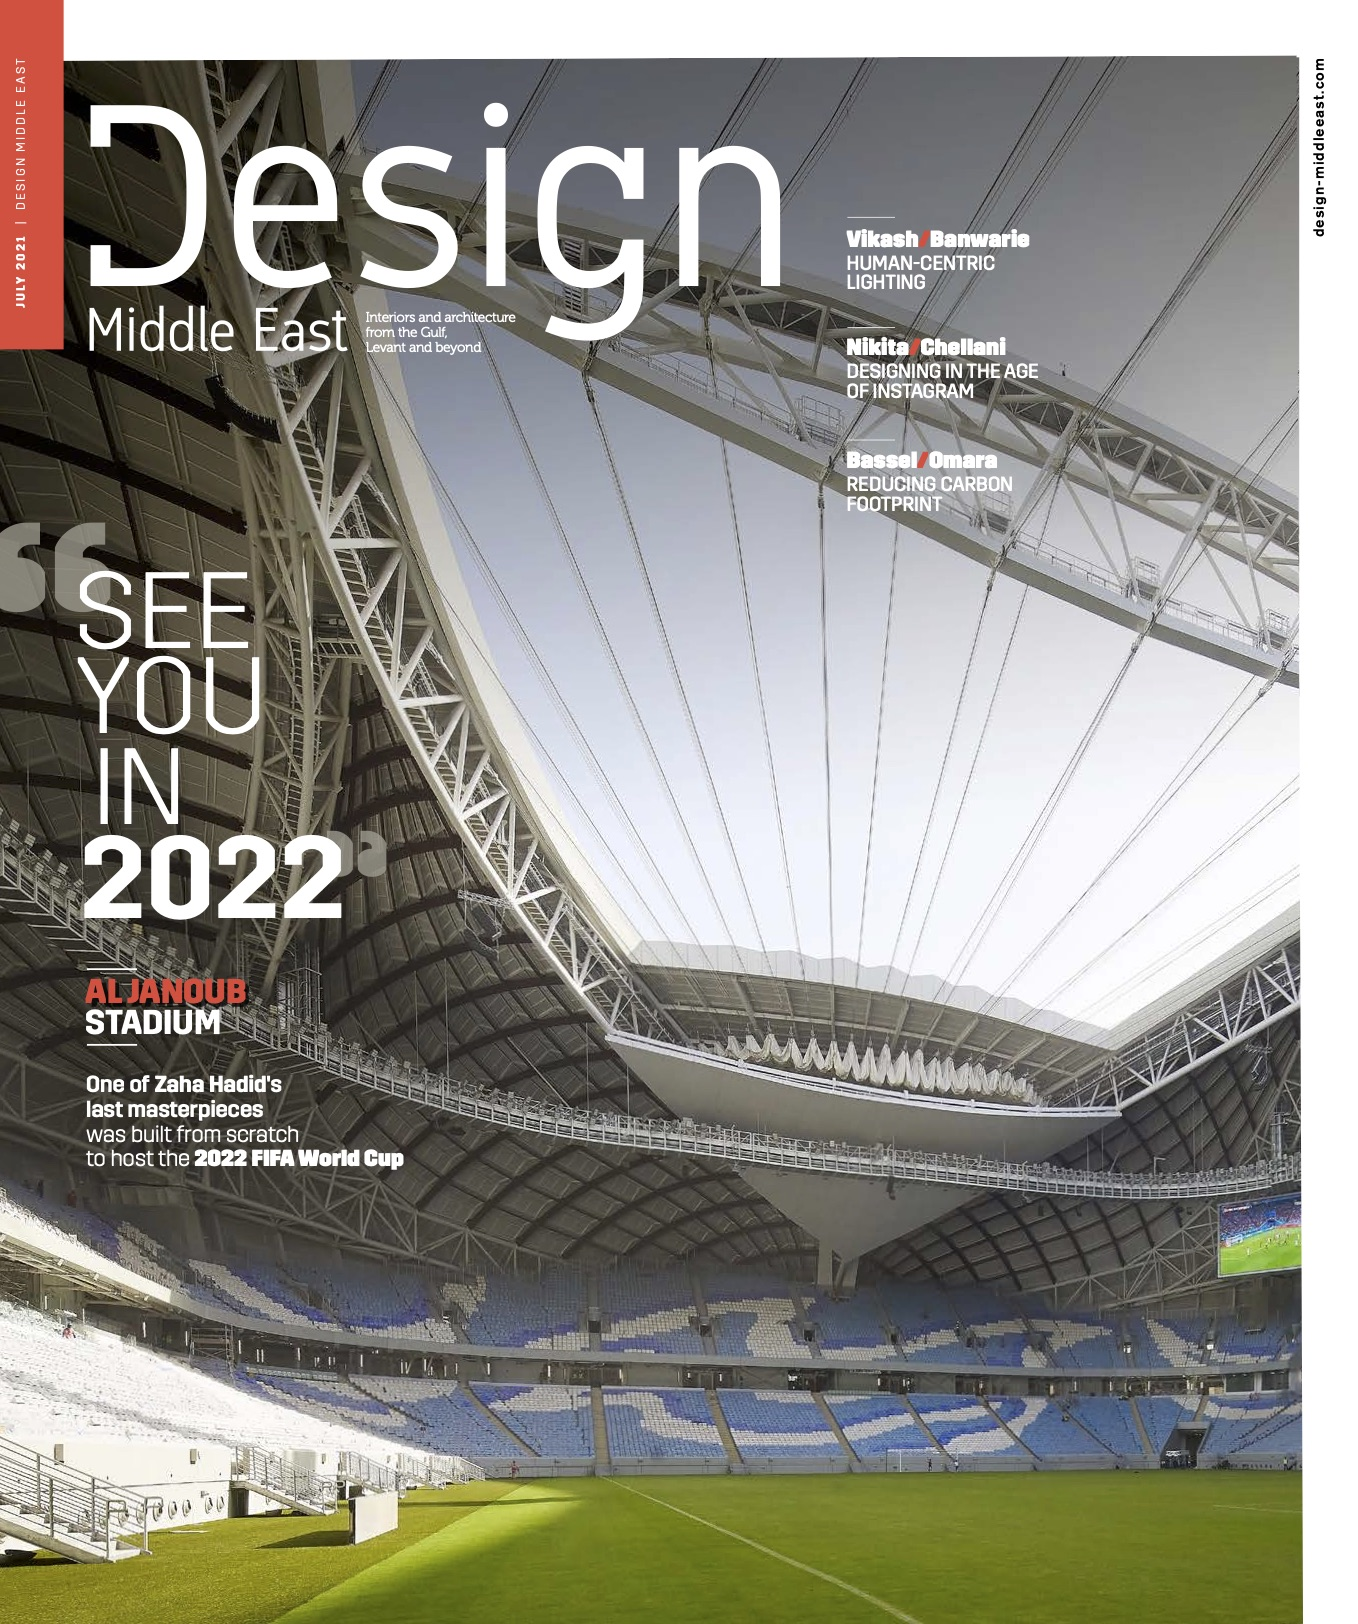 https://www.cbnme.com/magazines/design-me-july-2021/